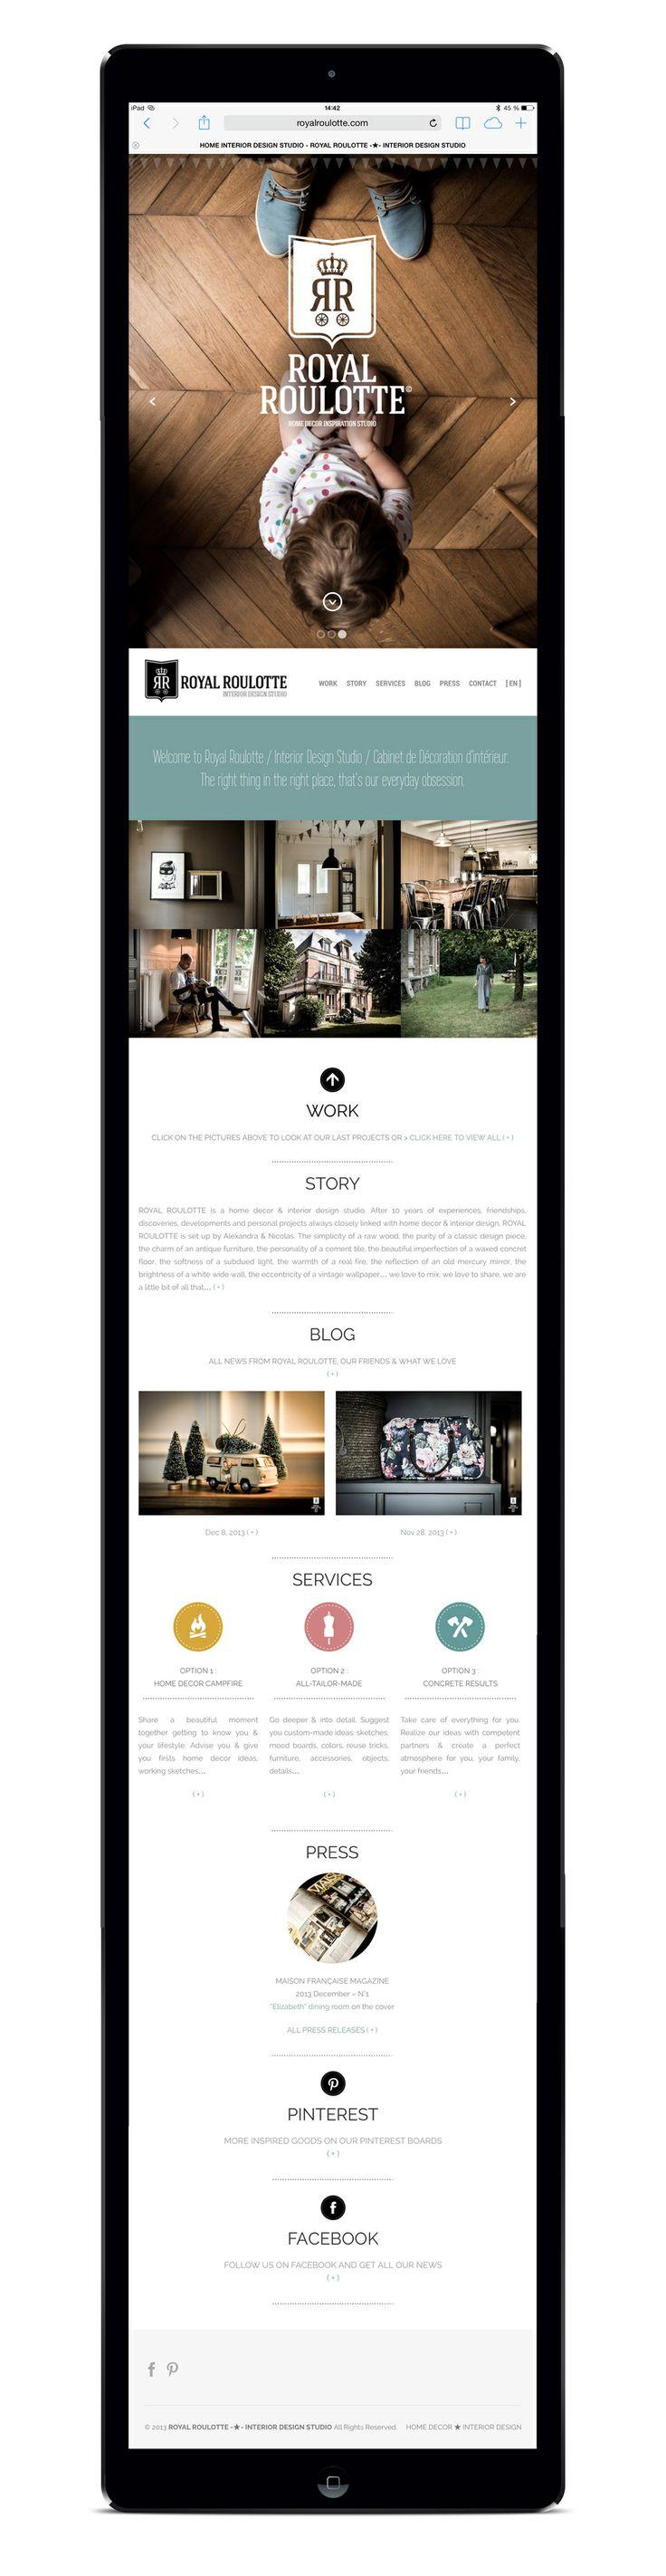 Royal Roulotte -★- Website